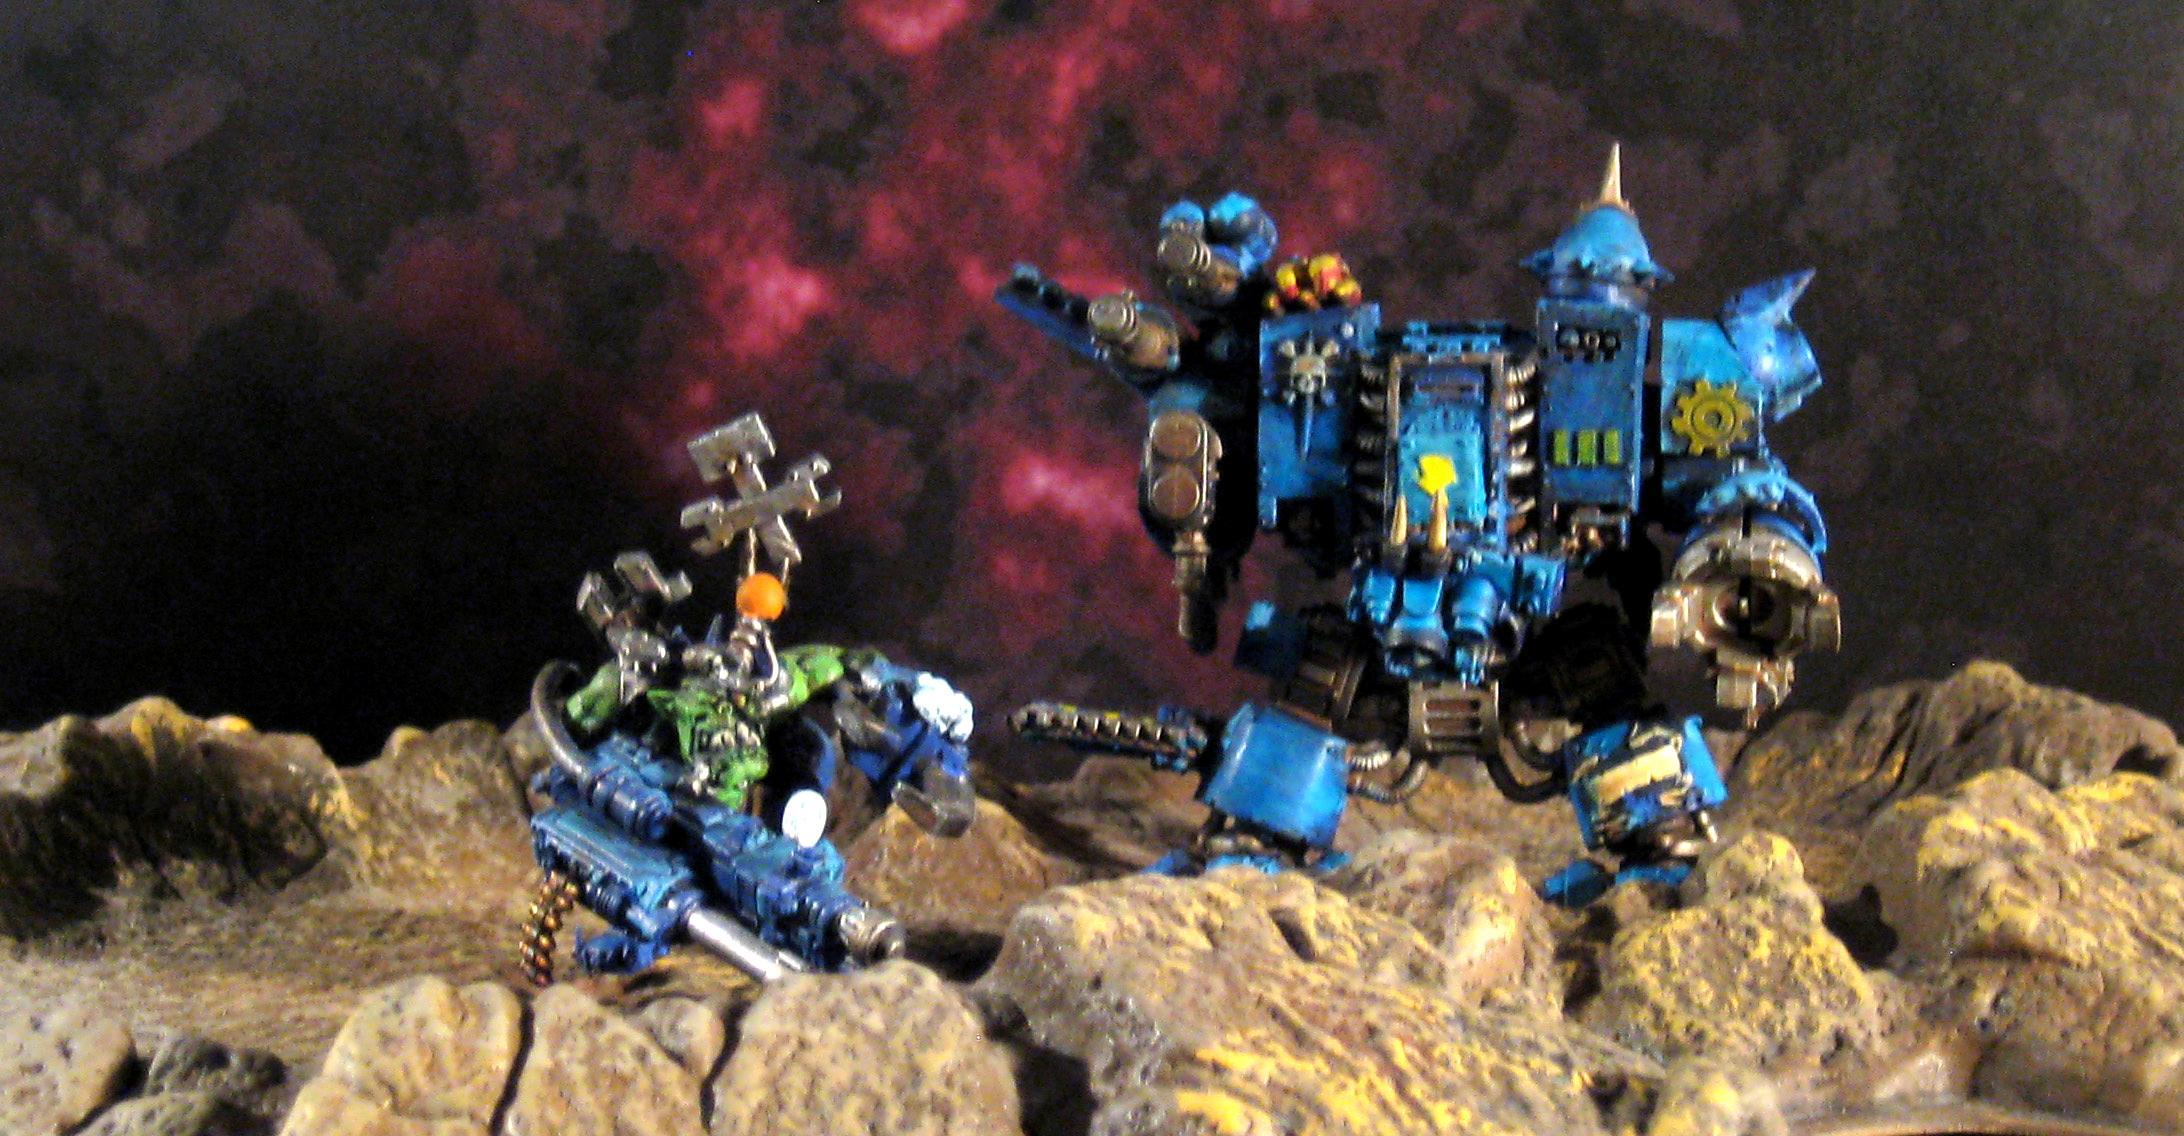 Big Mek, Conversion, Deathskulls, Deff Dread, Orks, Power Claw, Shoota-scorcha Kombi-weapon